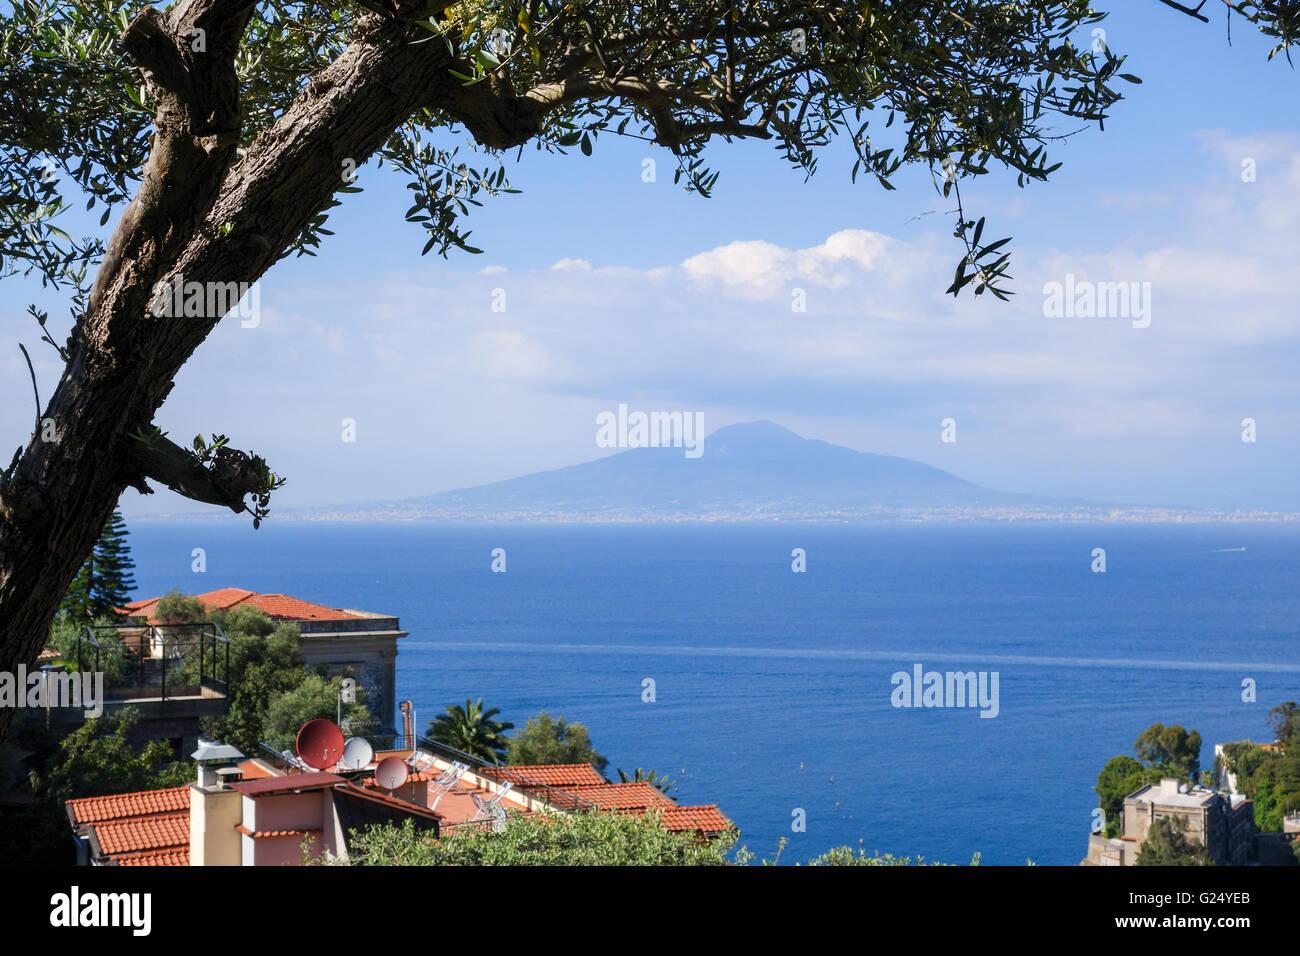 A view of Vesuvius towards the Bay of Naples Sorrento on the Sorrentine Peninsula Campania Italy Europe - Stock Image